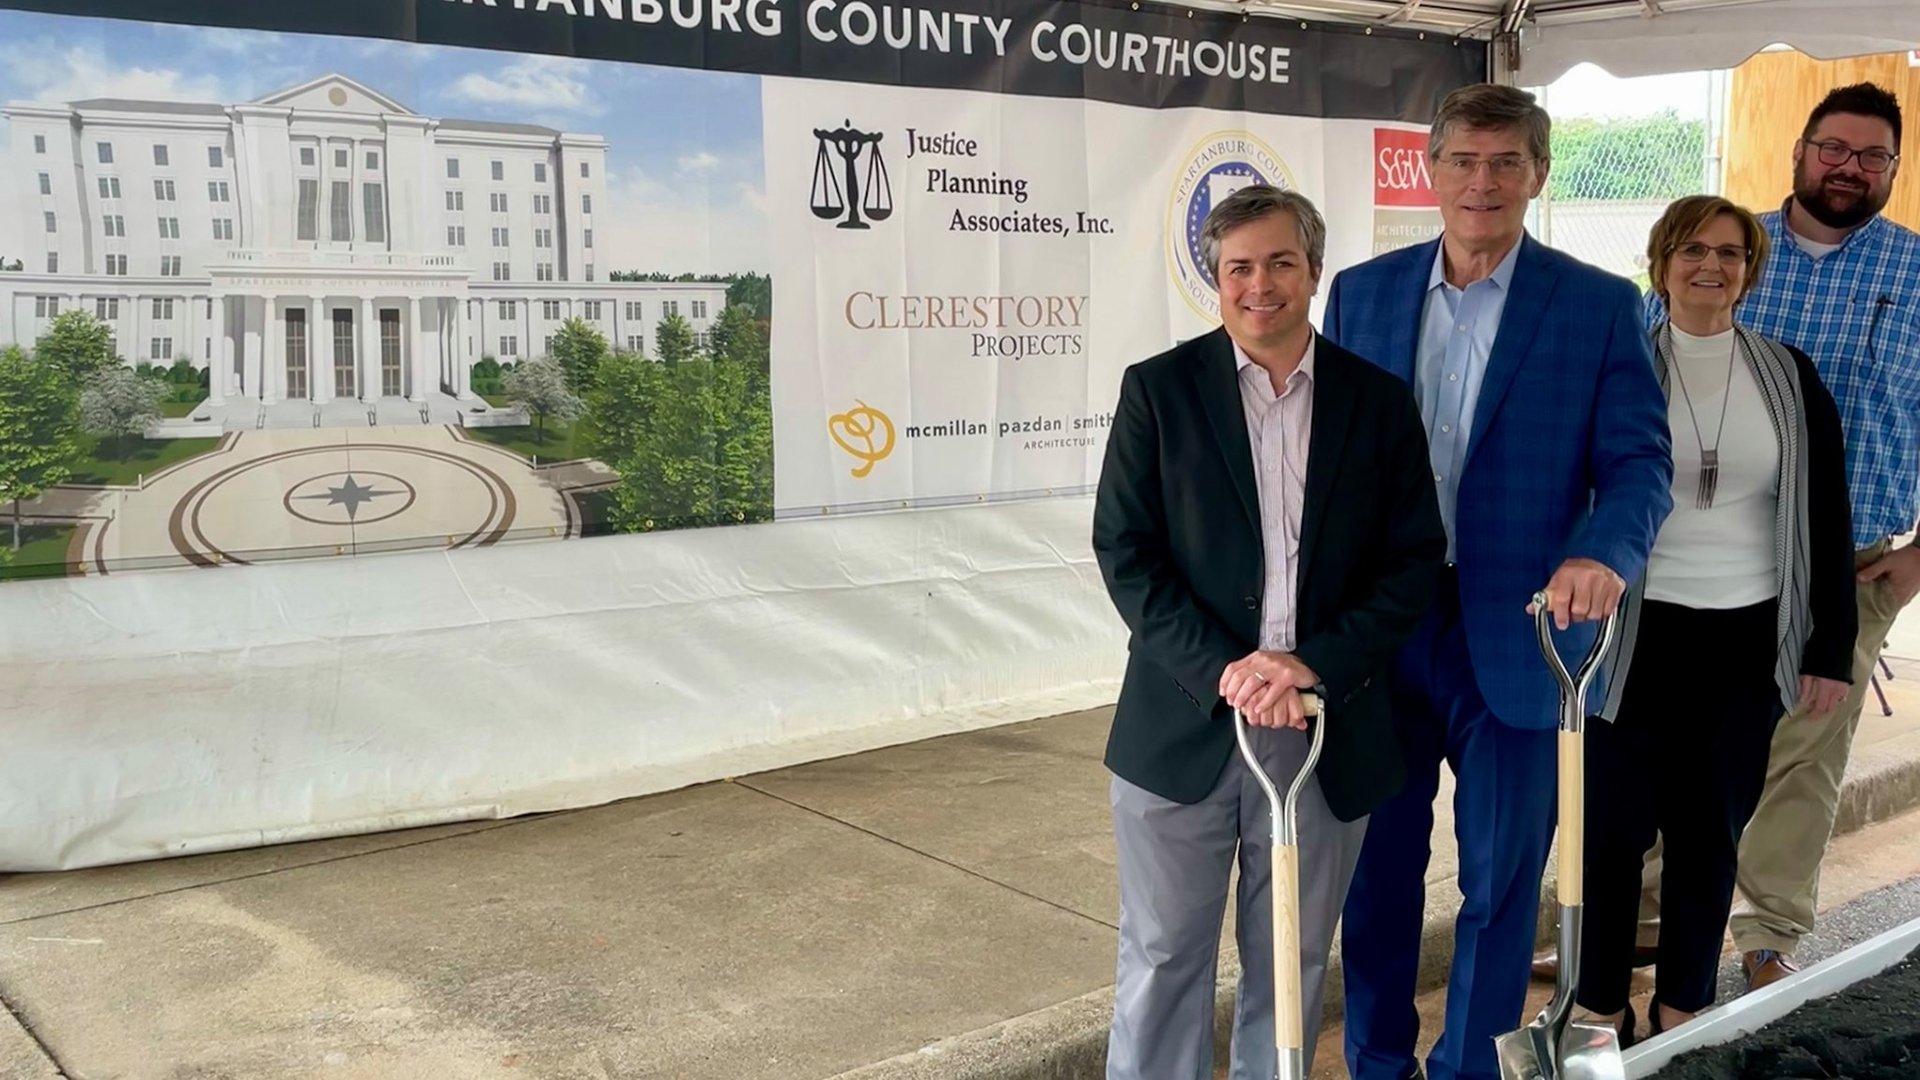 Spartanburg County Courthouse Groundbreaking